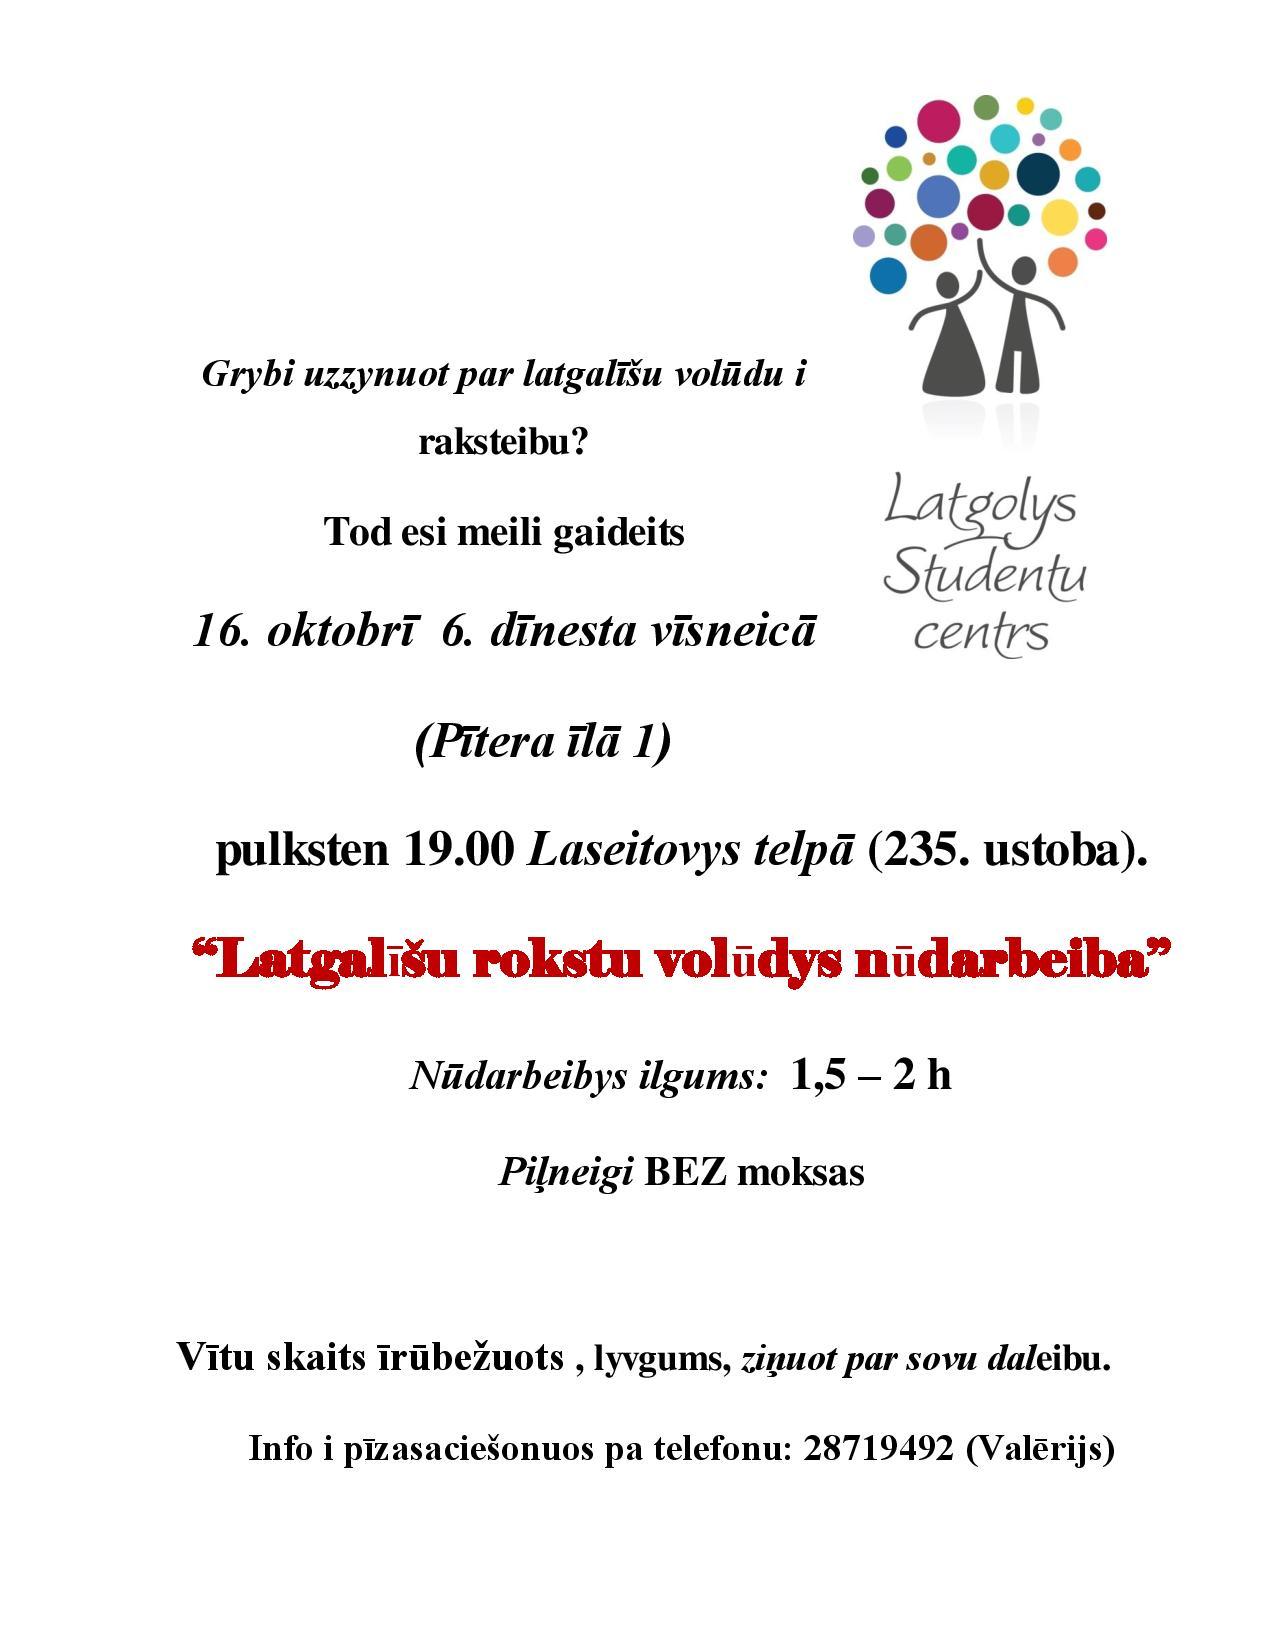 afisha2-valoda-page-001 (4)